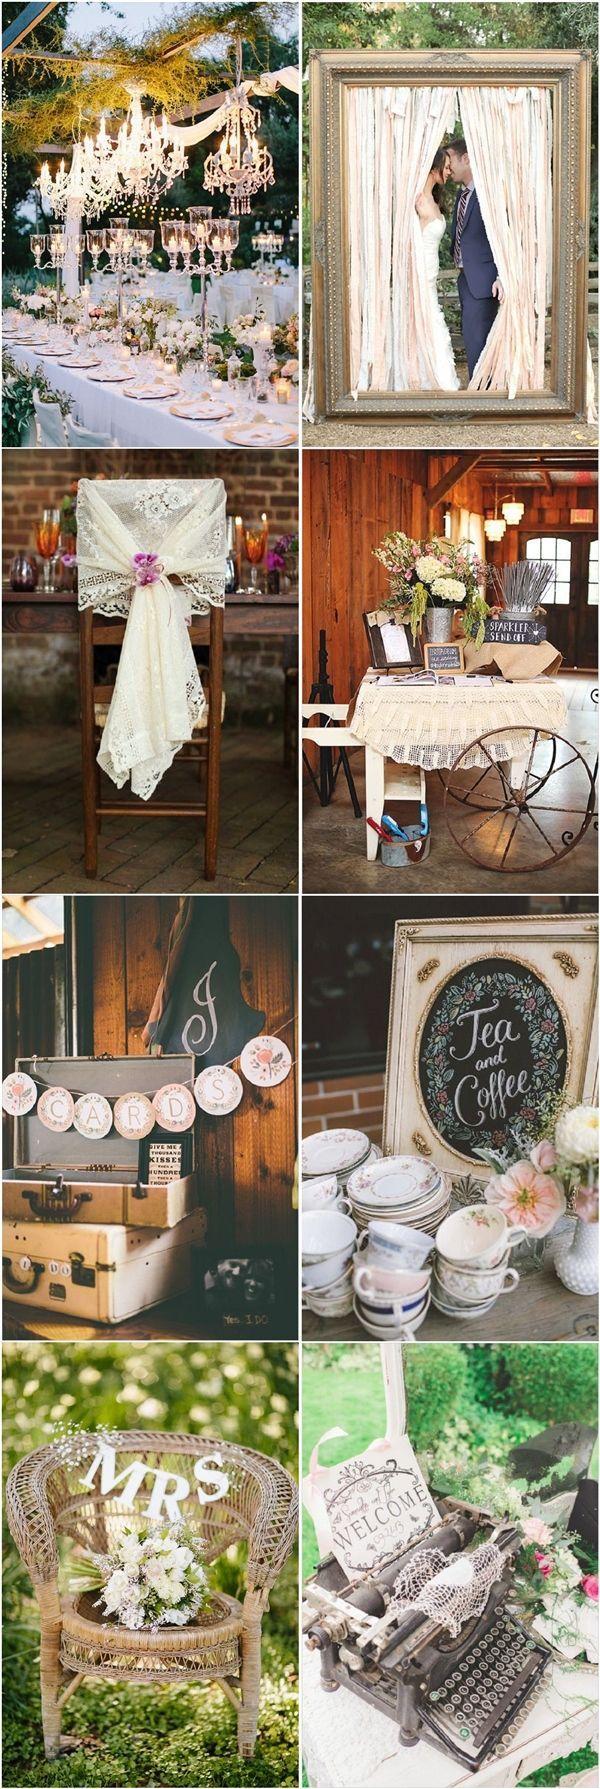 28 Vintage Wedding Ideas For Spring Summer Weddings 2544010 Weddbook